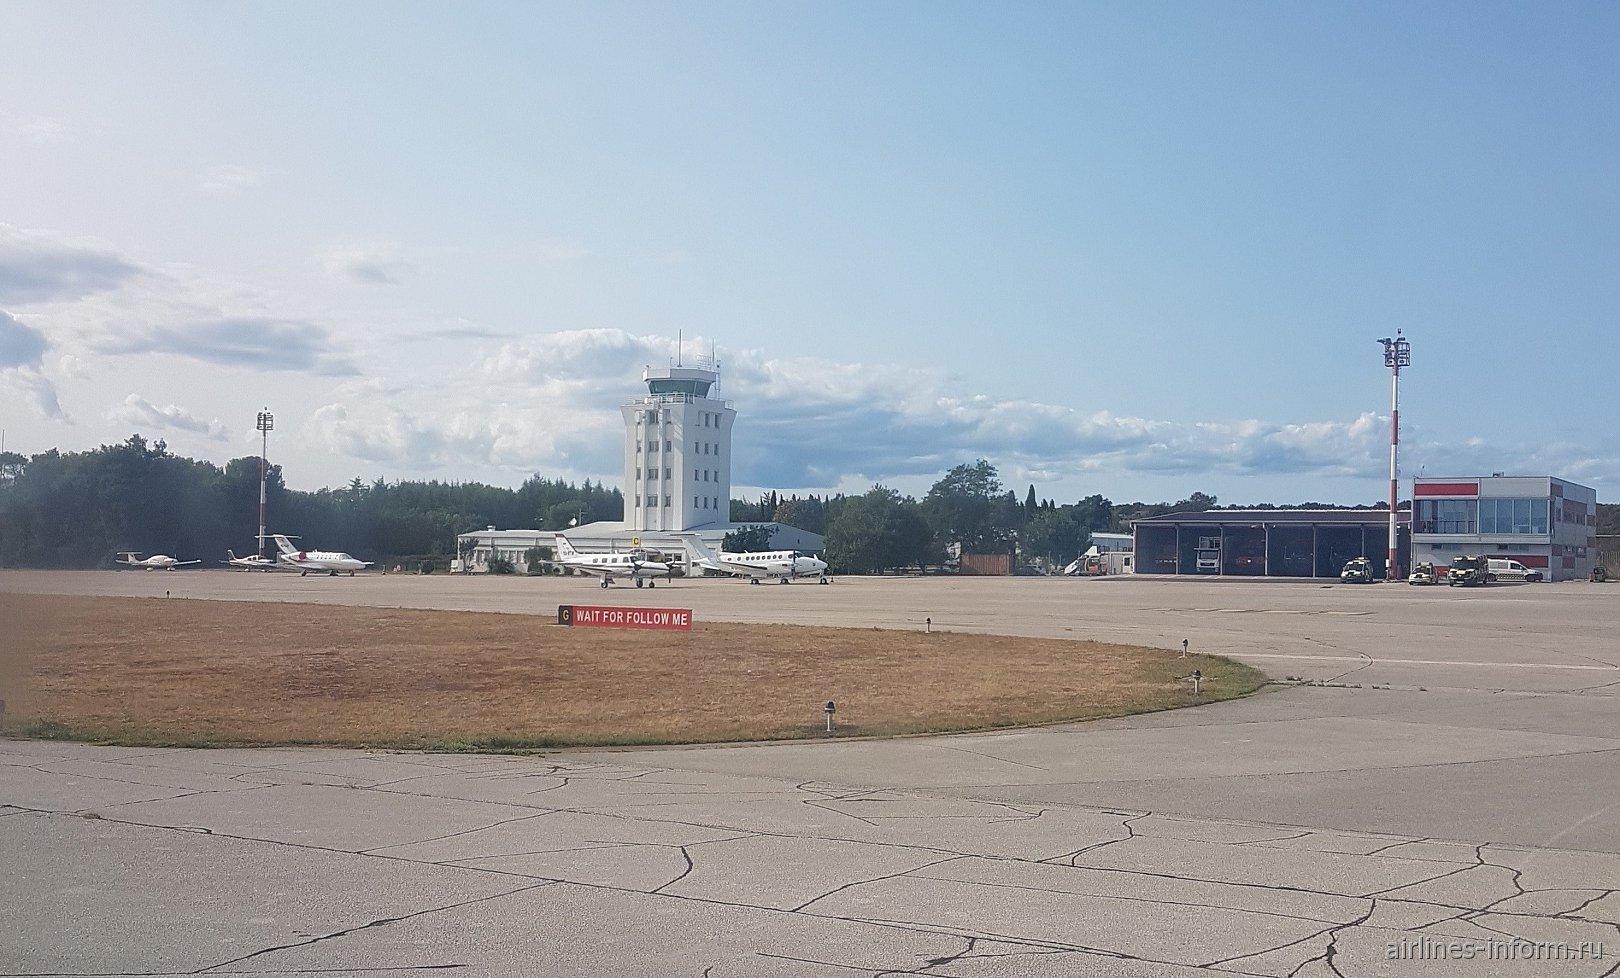 Перрон бизнес-авиации в аэропорту Пула